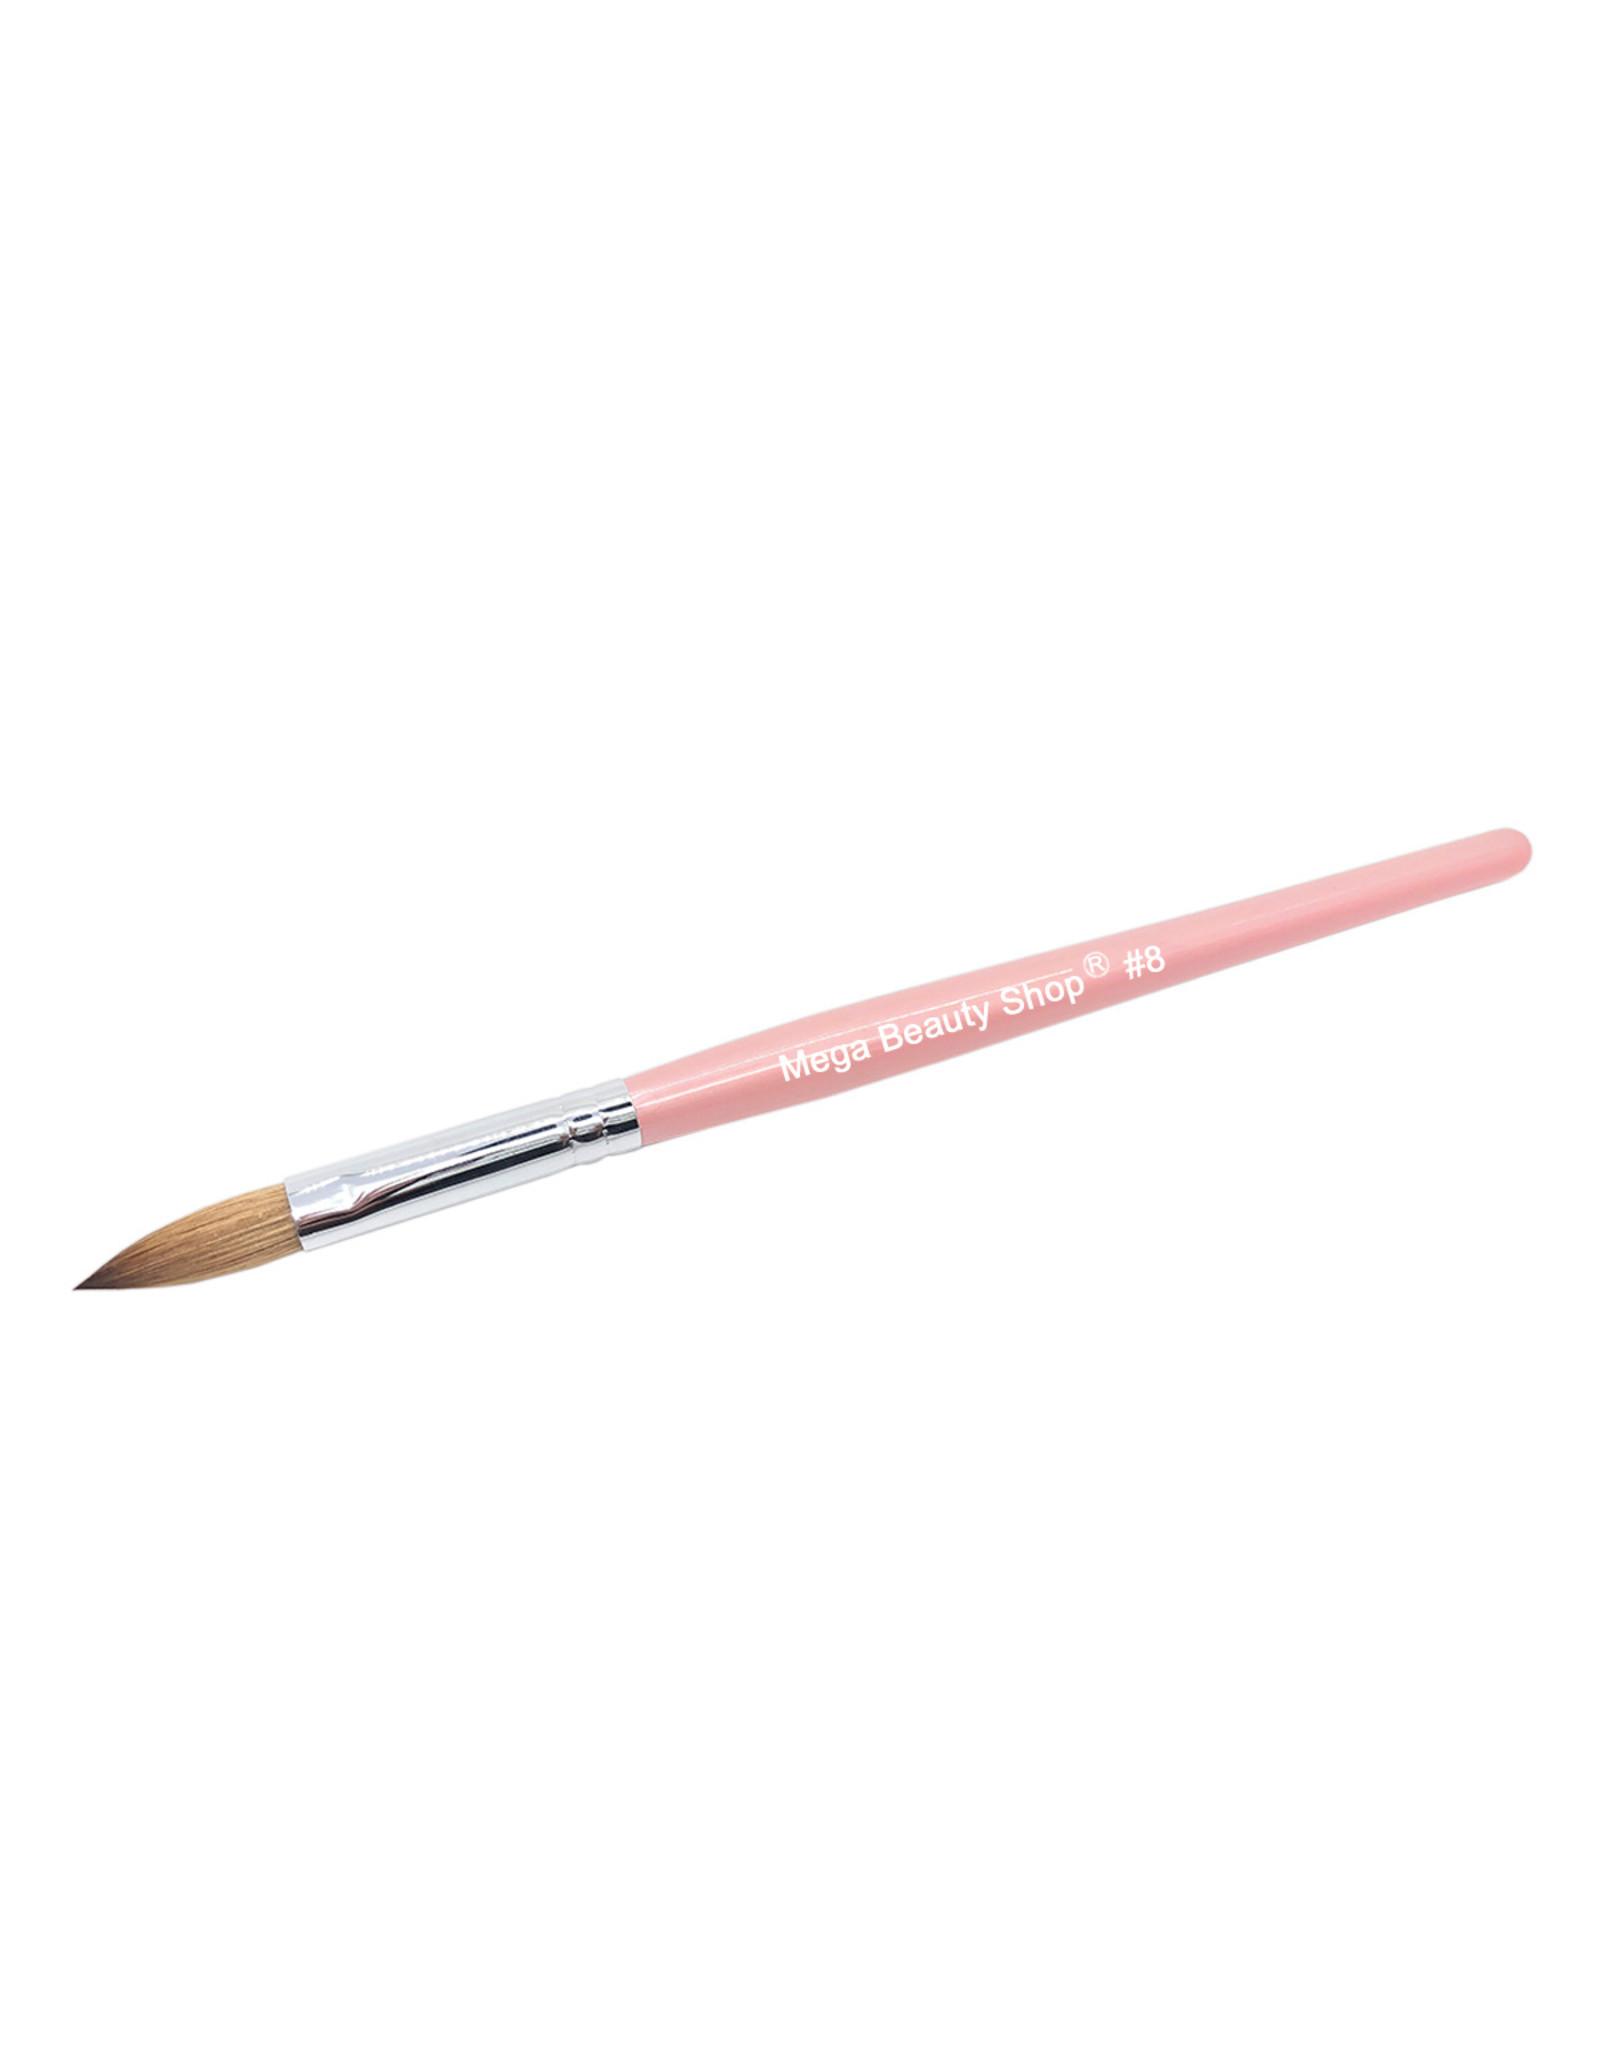 Mega Beauty Shop® Kolinsky acryl penseel - oval #8